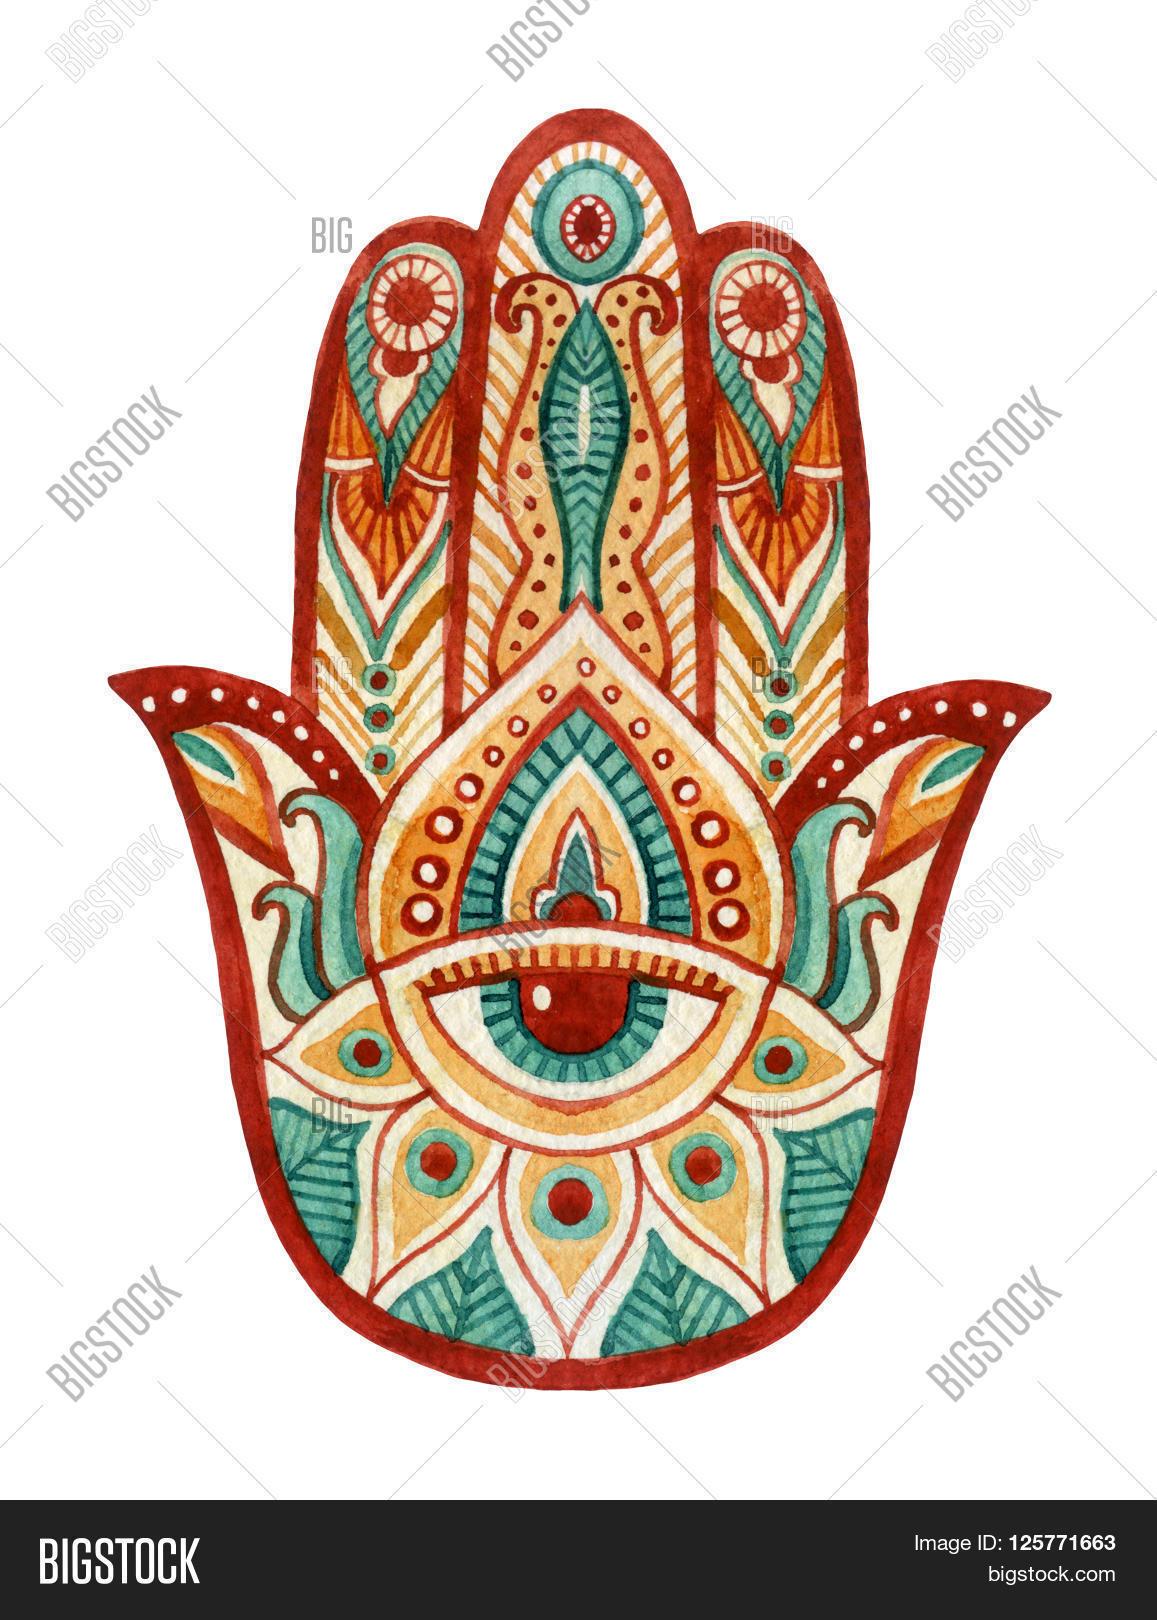 Hamsa Hand Watercolor Image Photo Free Trial Bigstock